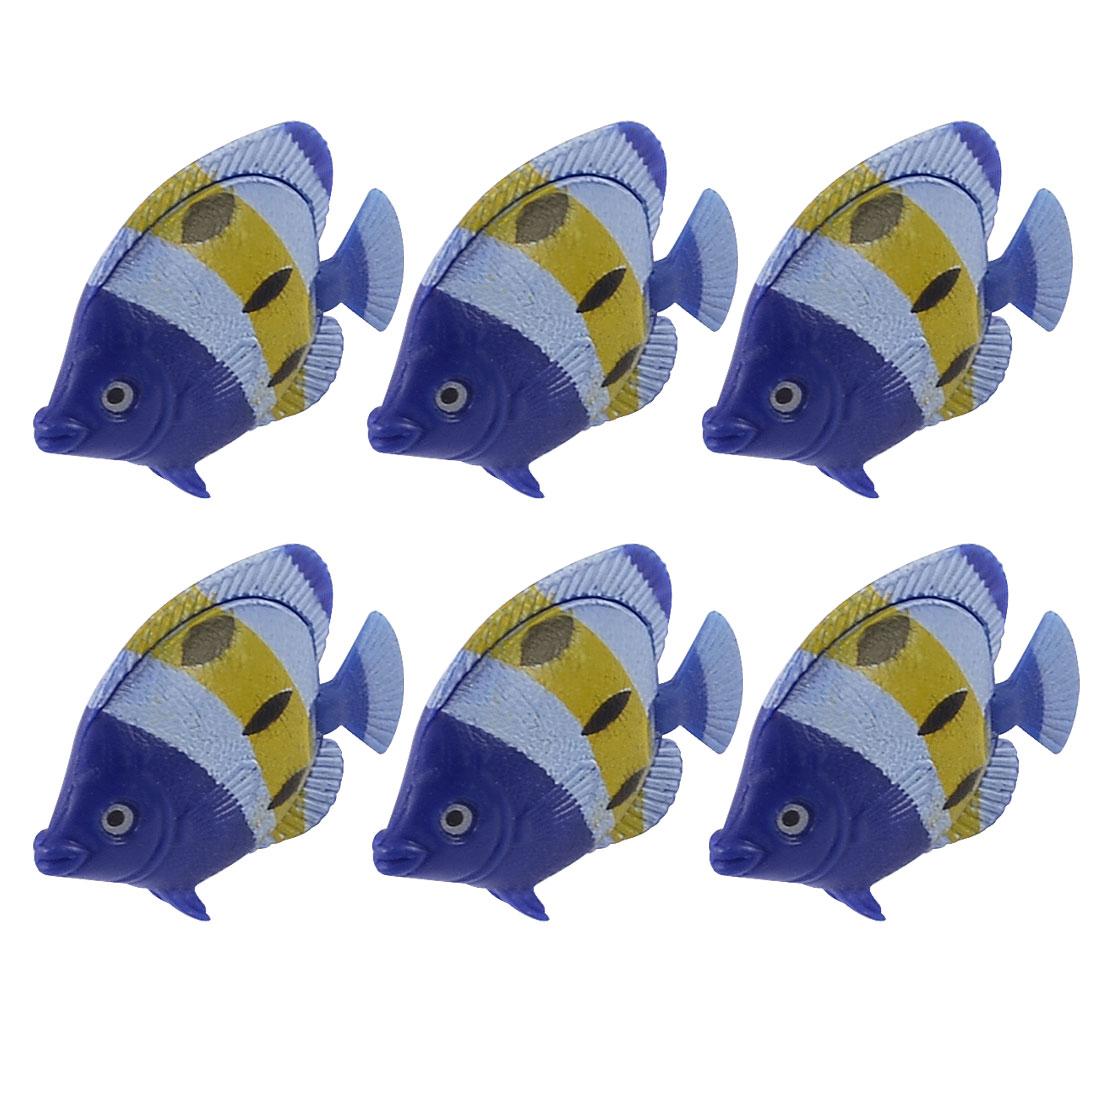 Blue Yellow Plastic Simulated Floating Fish Ornament 6 Pcs for Aquarium Tank